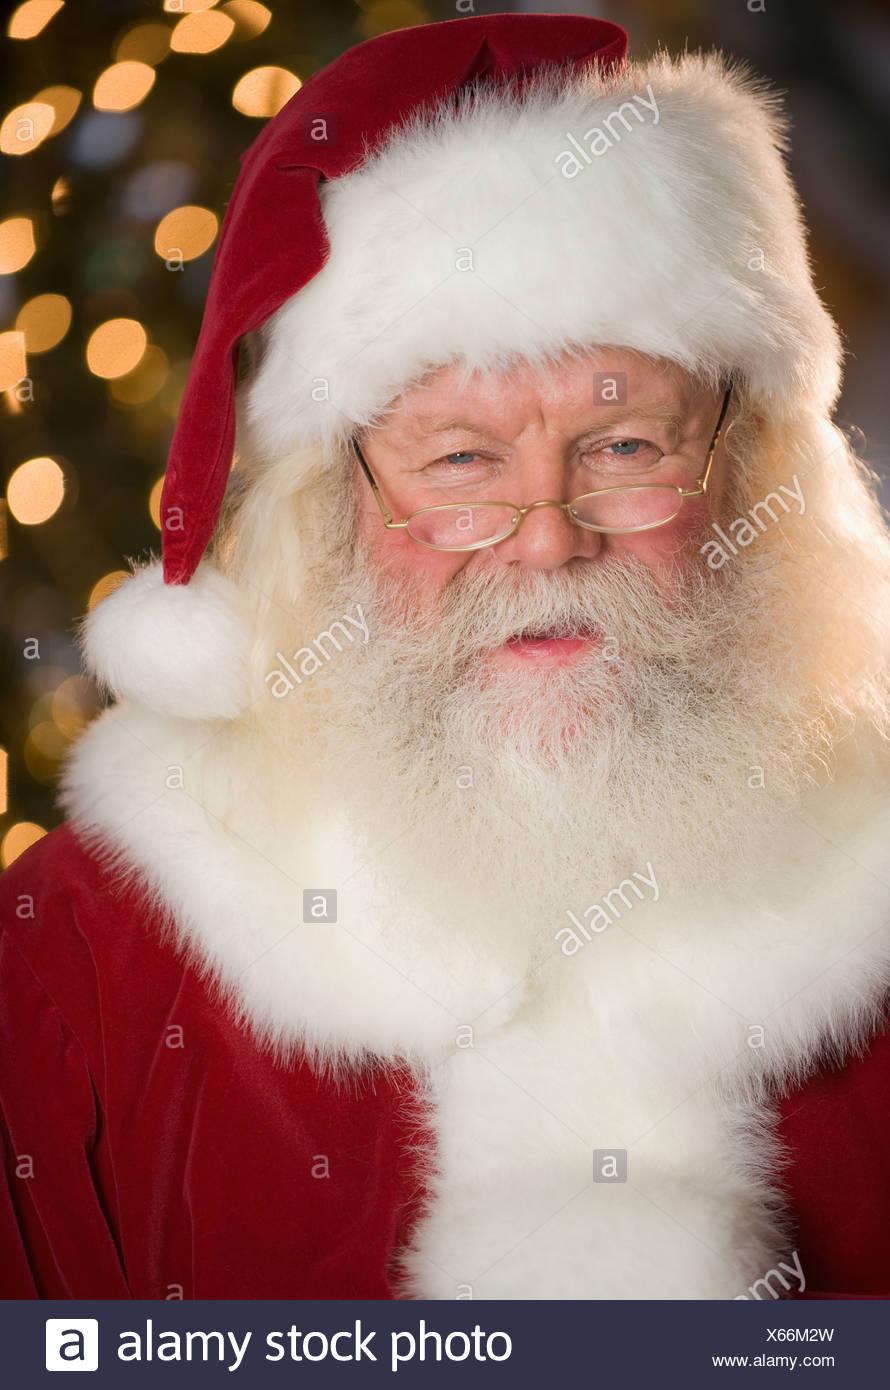 Portrait of Santa Claus - Stock Image